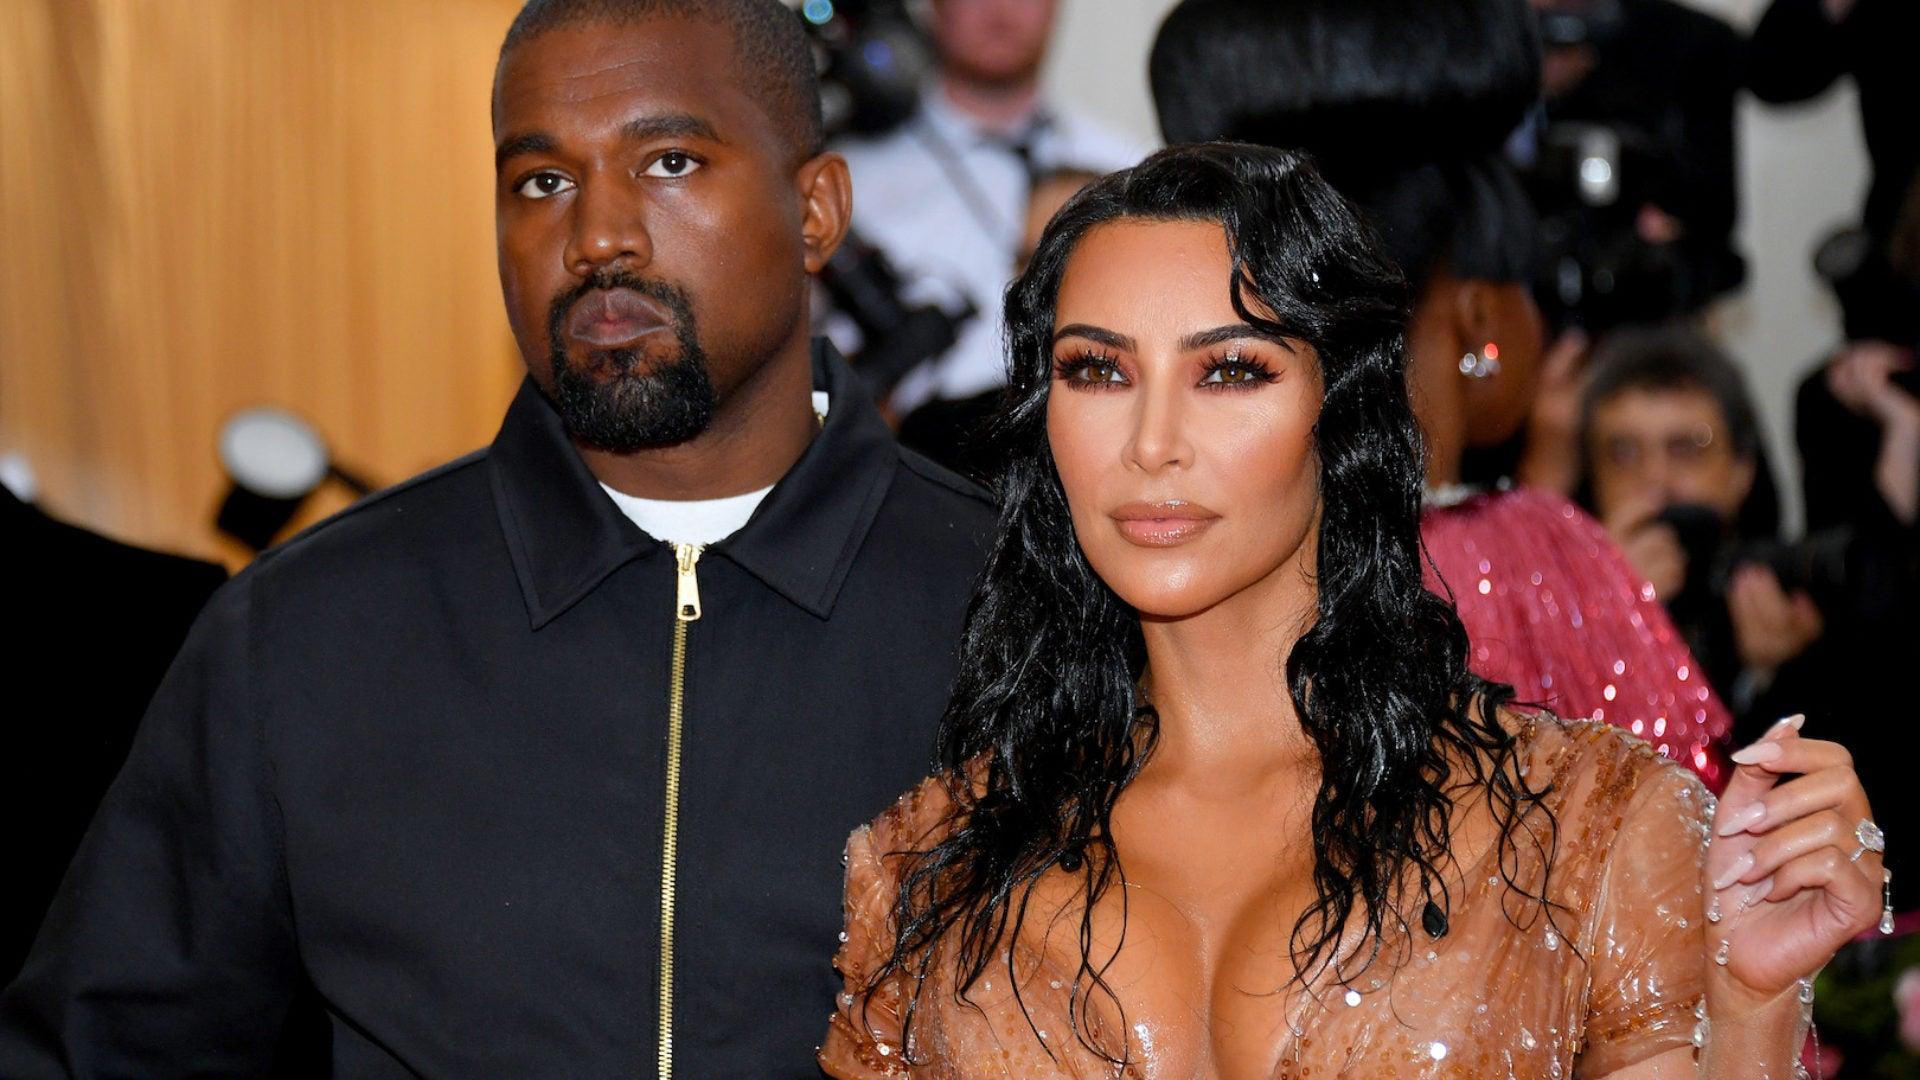 Kanye West And Kim Kardashian West Welcome Their Fourth Child